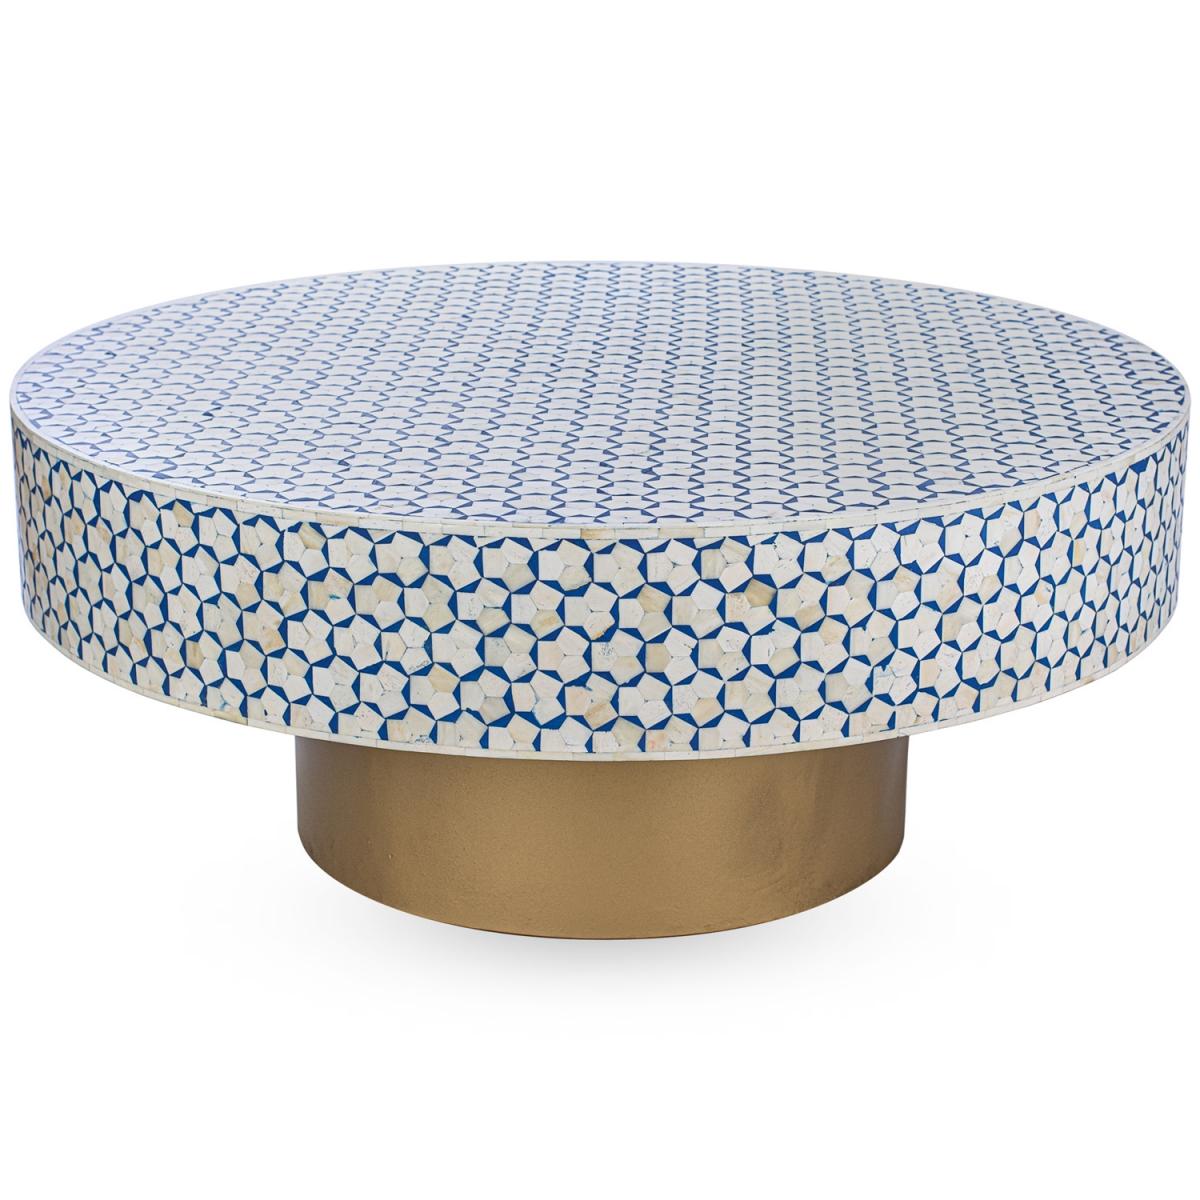 Стол голубой отделка кость BONE INLAY COFFEE TABLE  - фото 1